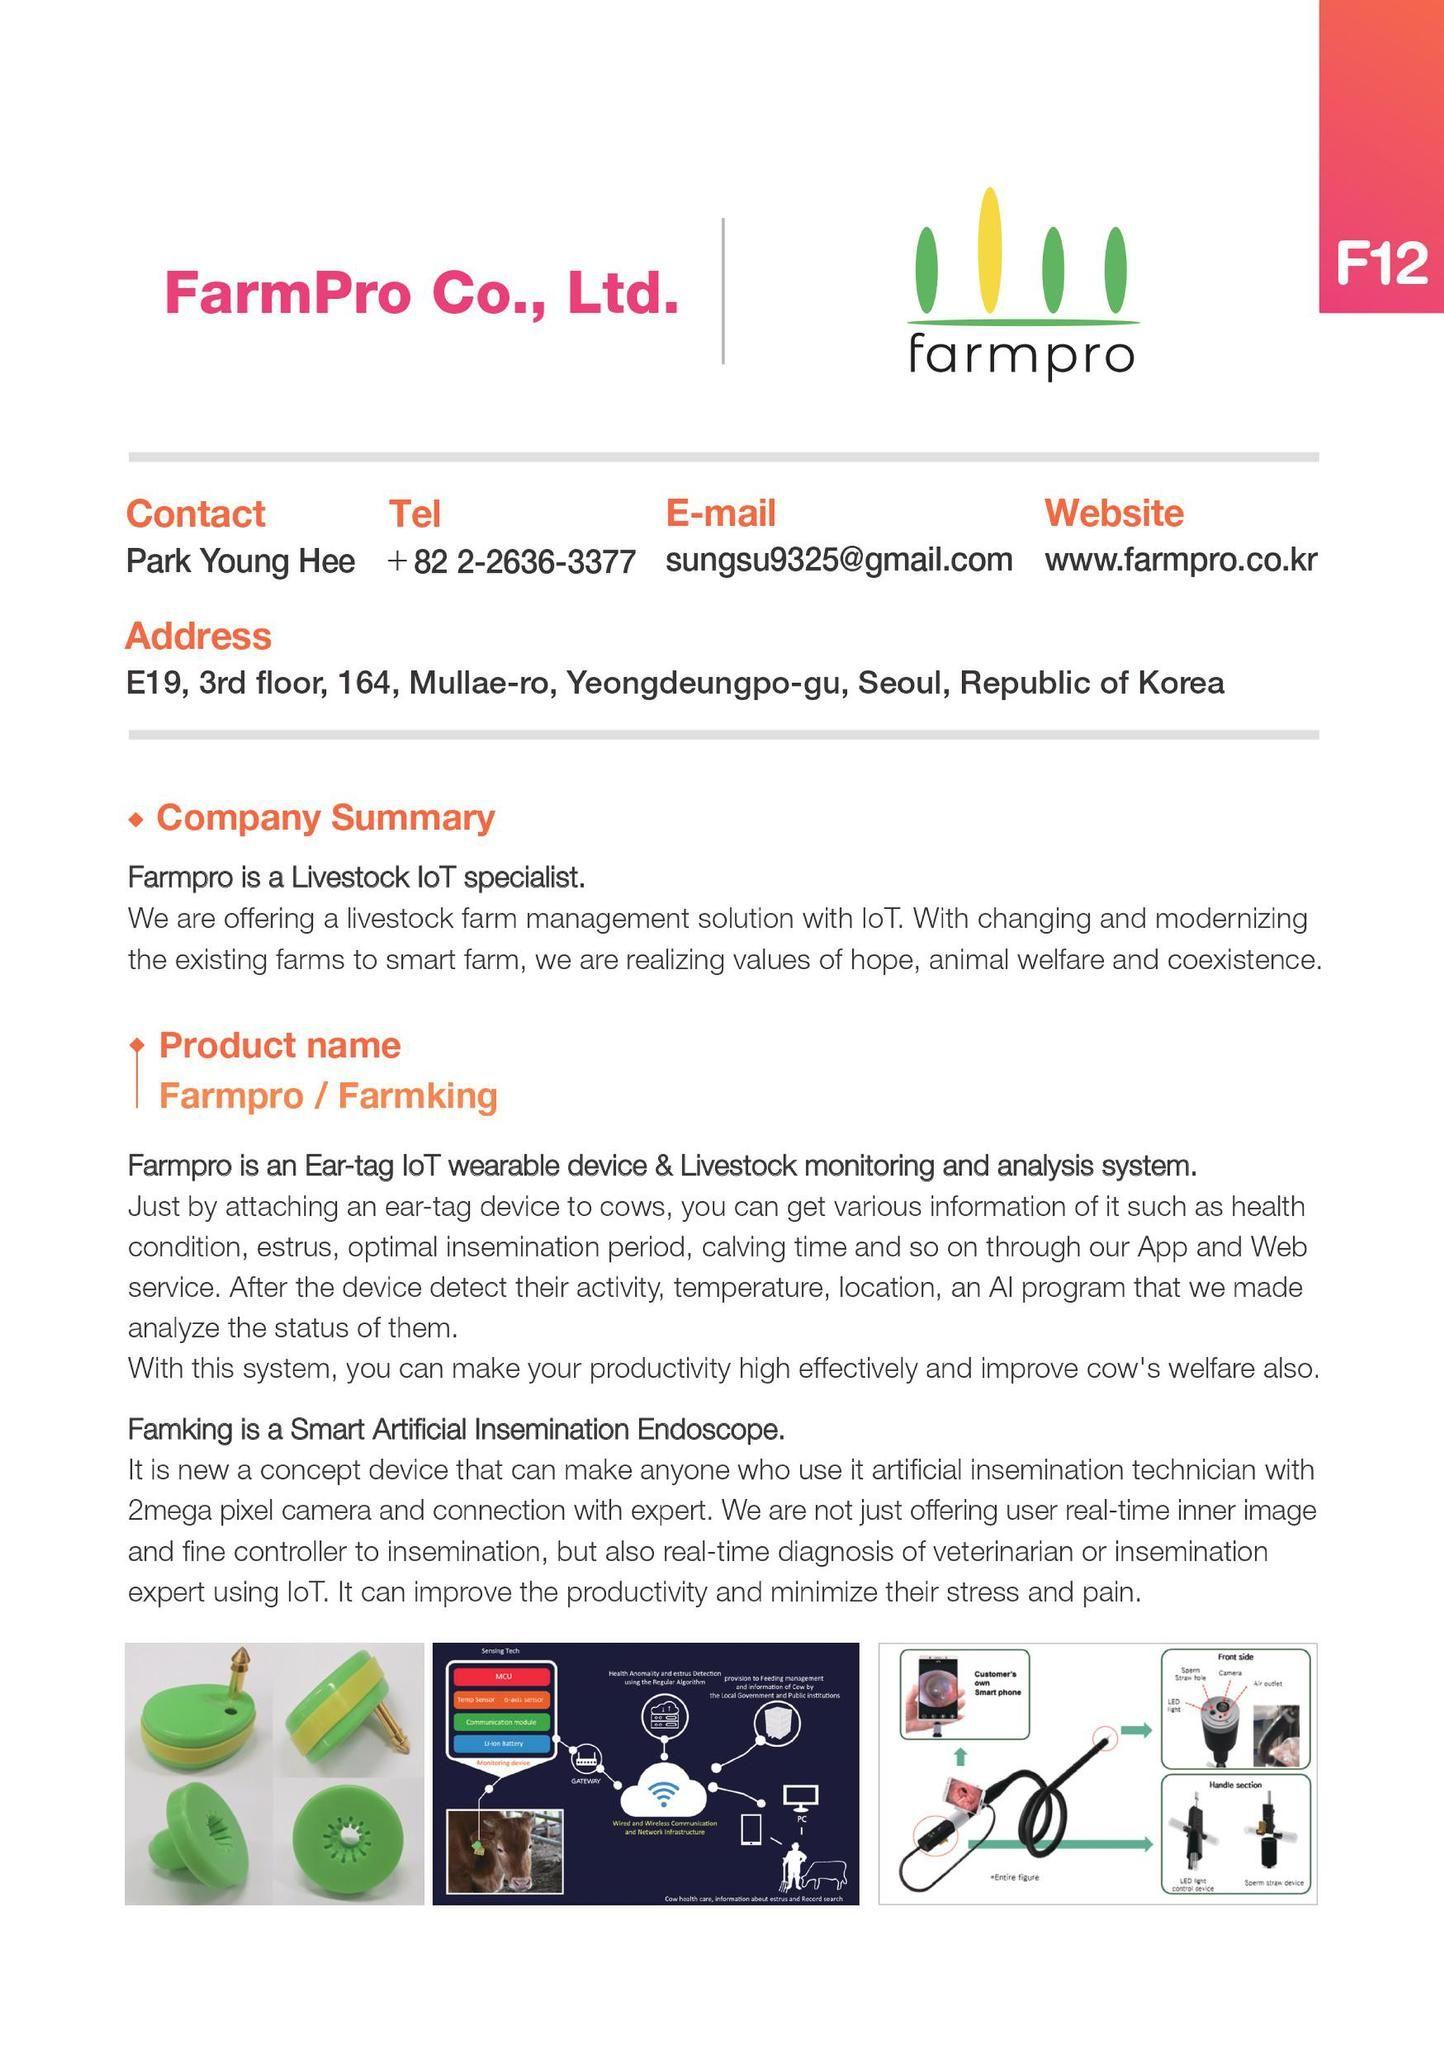 FarmPro Co. Ltd.